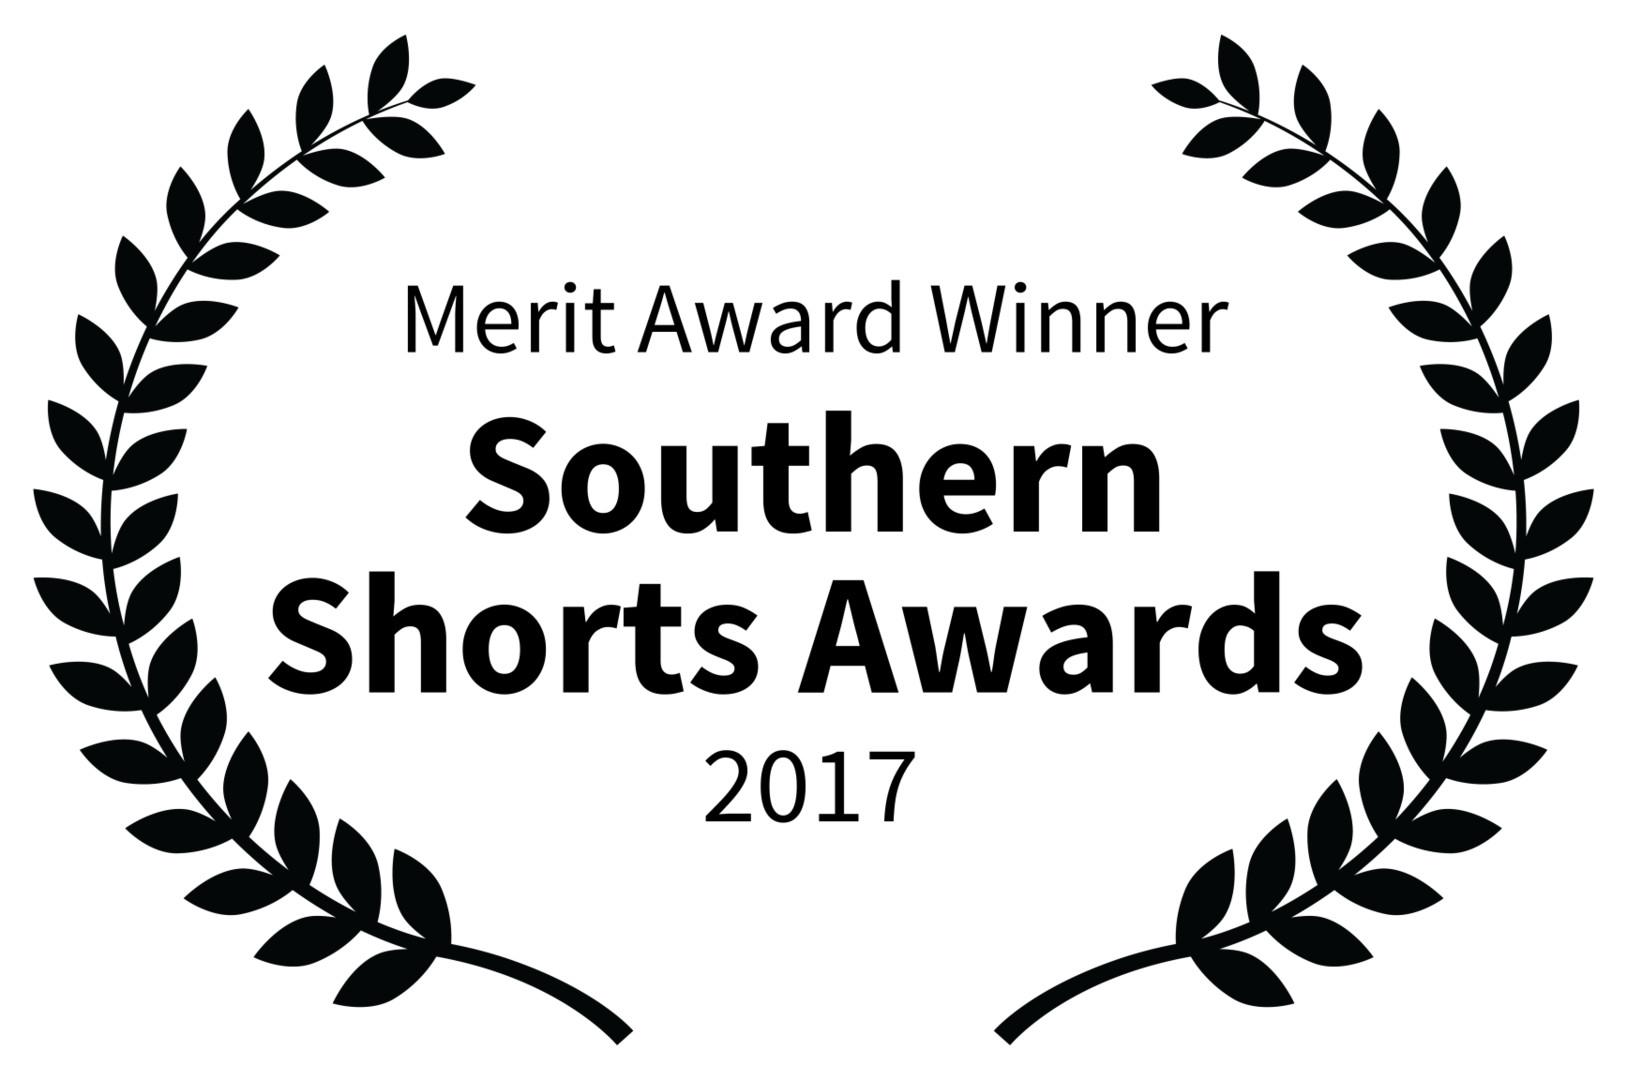 Merit_Award_Winner_-_Southern_Shorts_Awards_-_2017.jpg